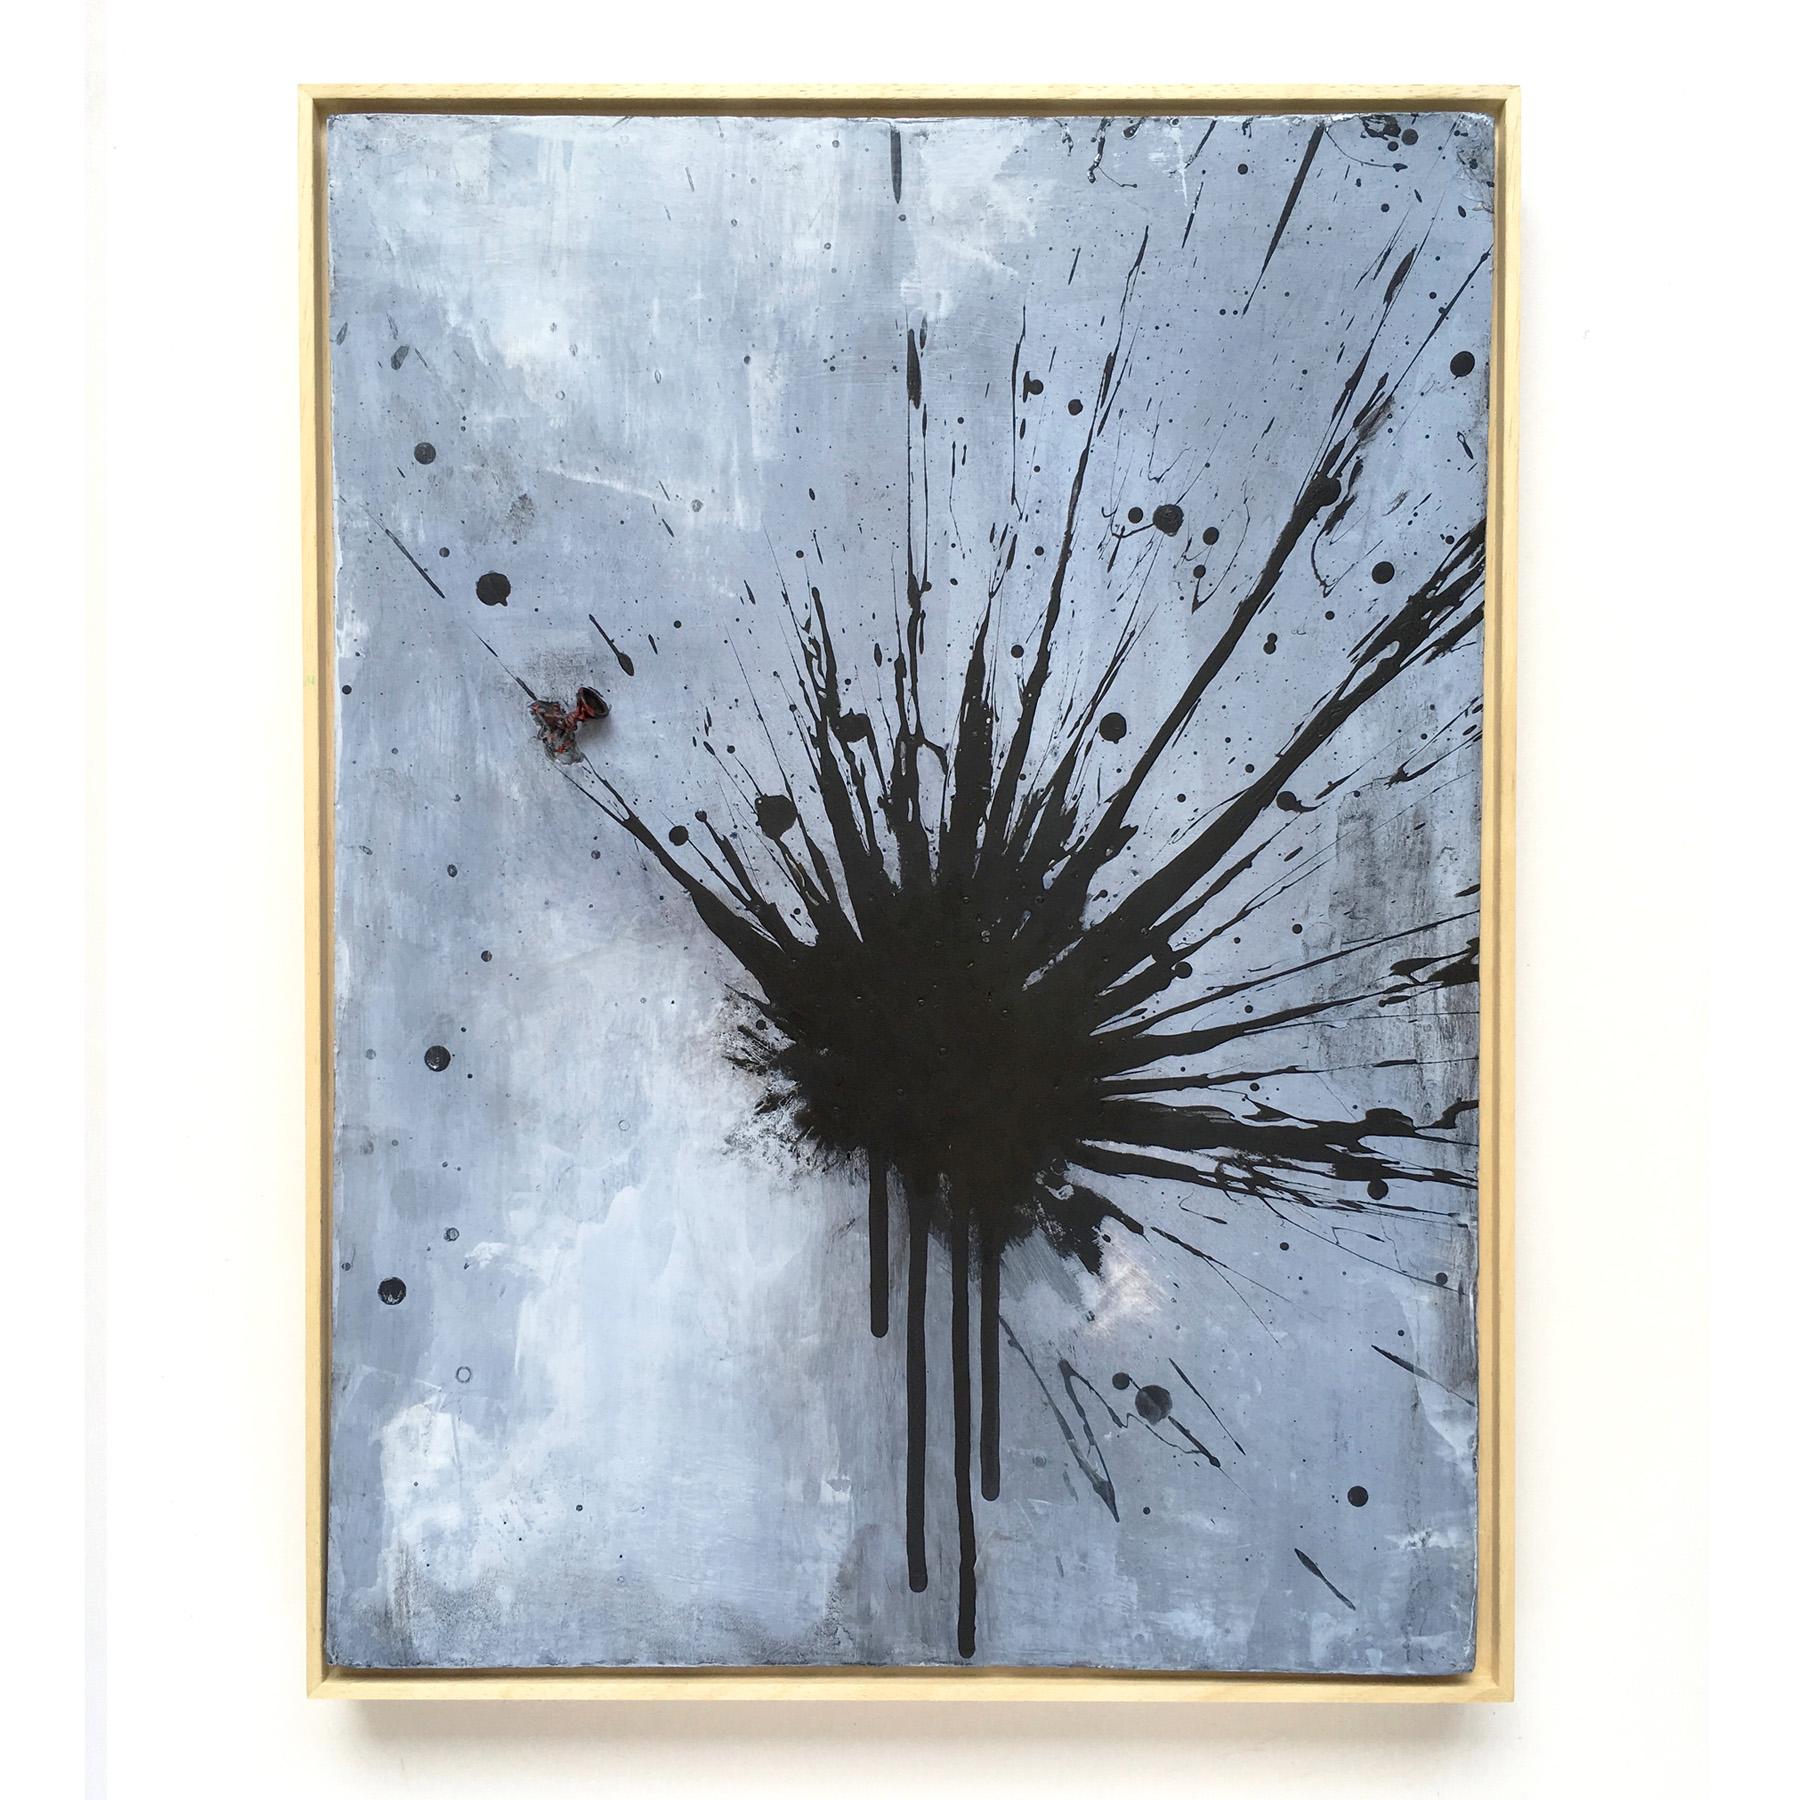 Black Firework Painting 23.09.19